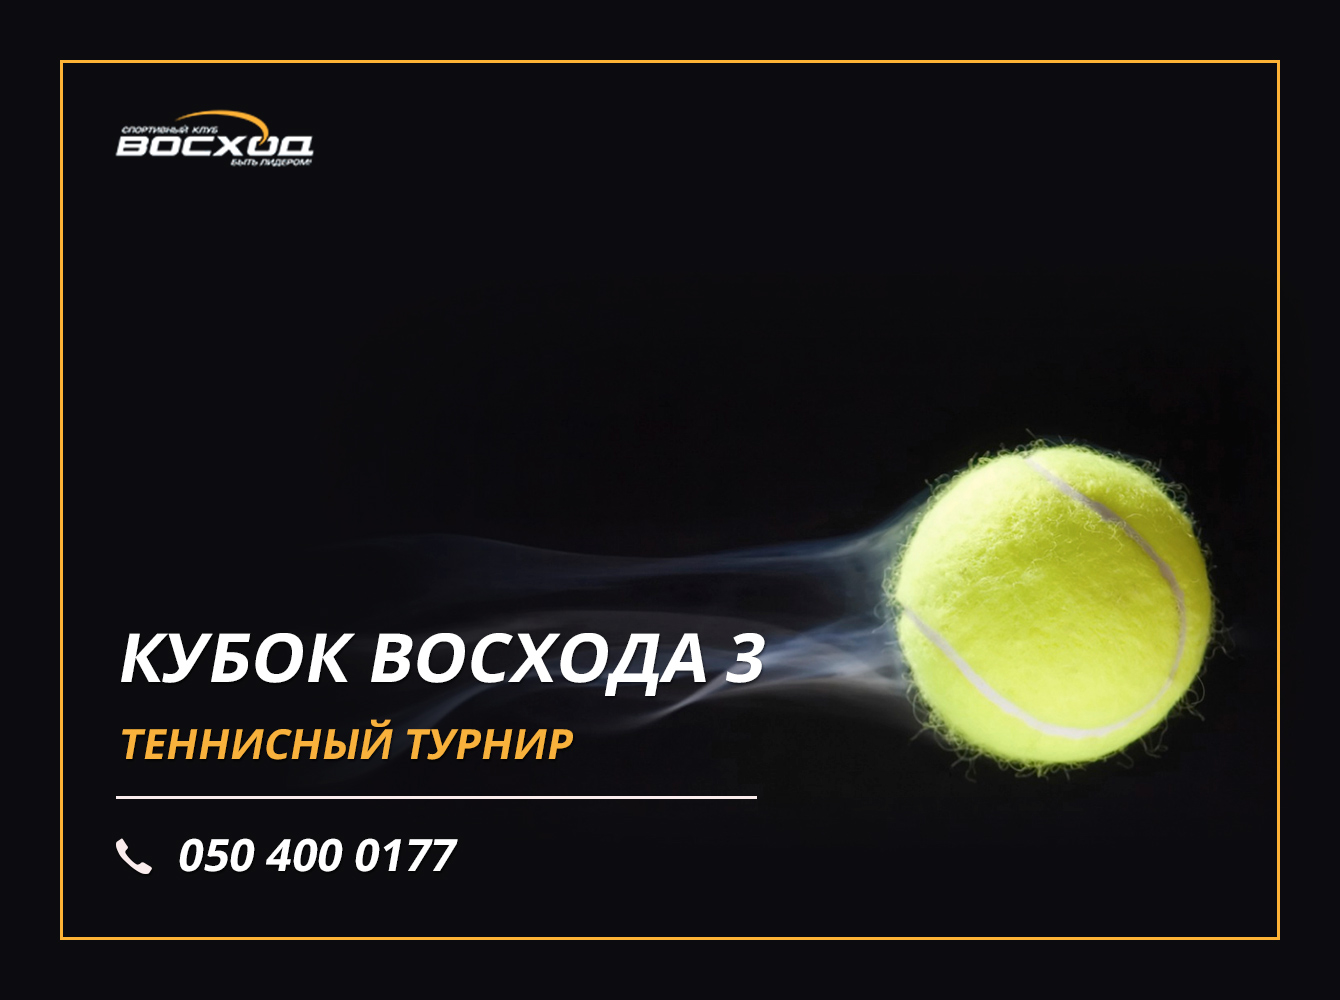 Кубок Восхода 3